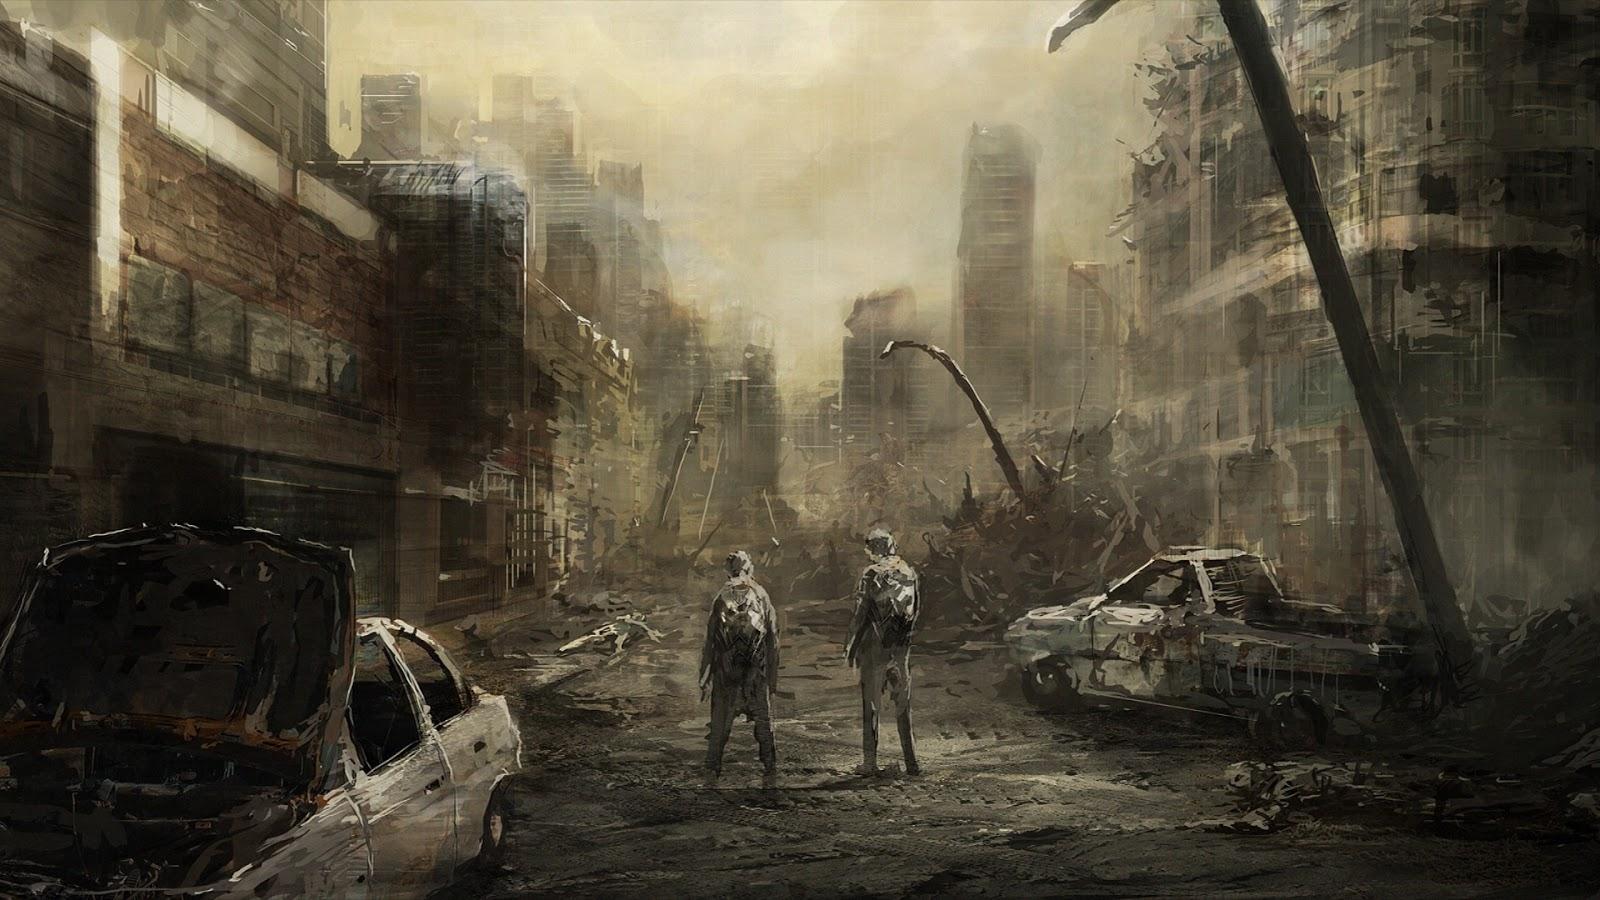 Post Apocalyptic Background - 1600x900 - Download HD Wallpaper -  WallpaperTip